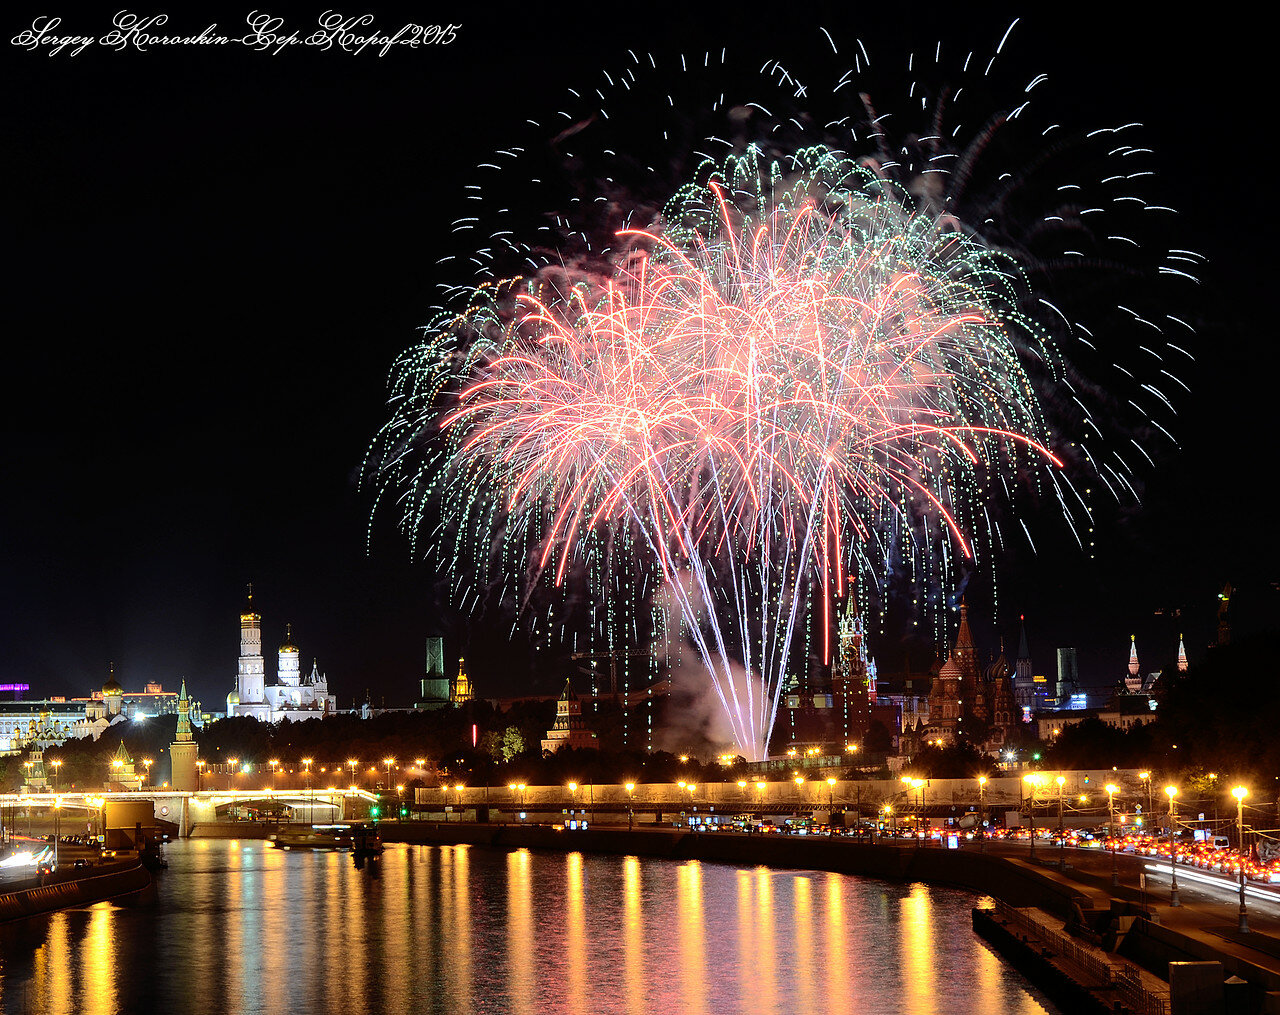 Салют фестиваля Спасская Башня 2015 №22